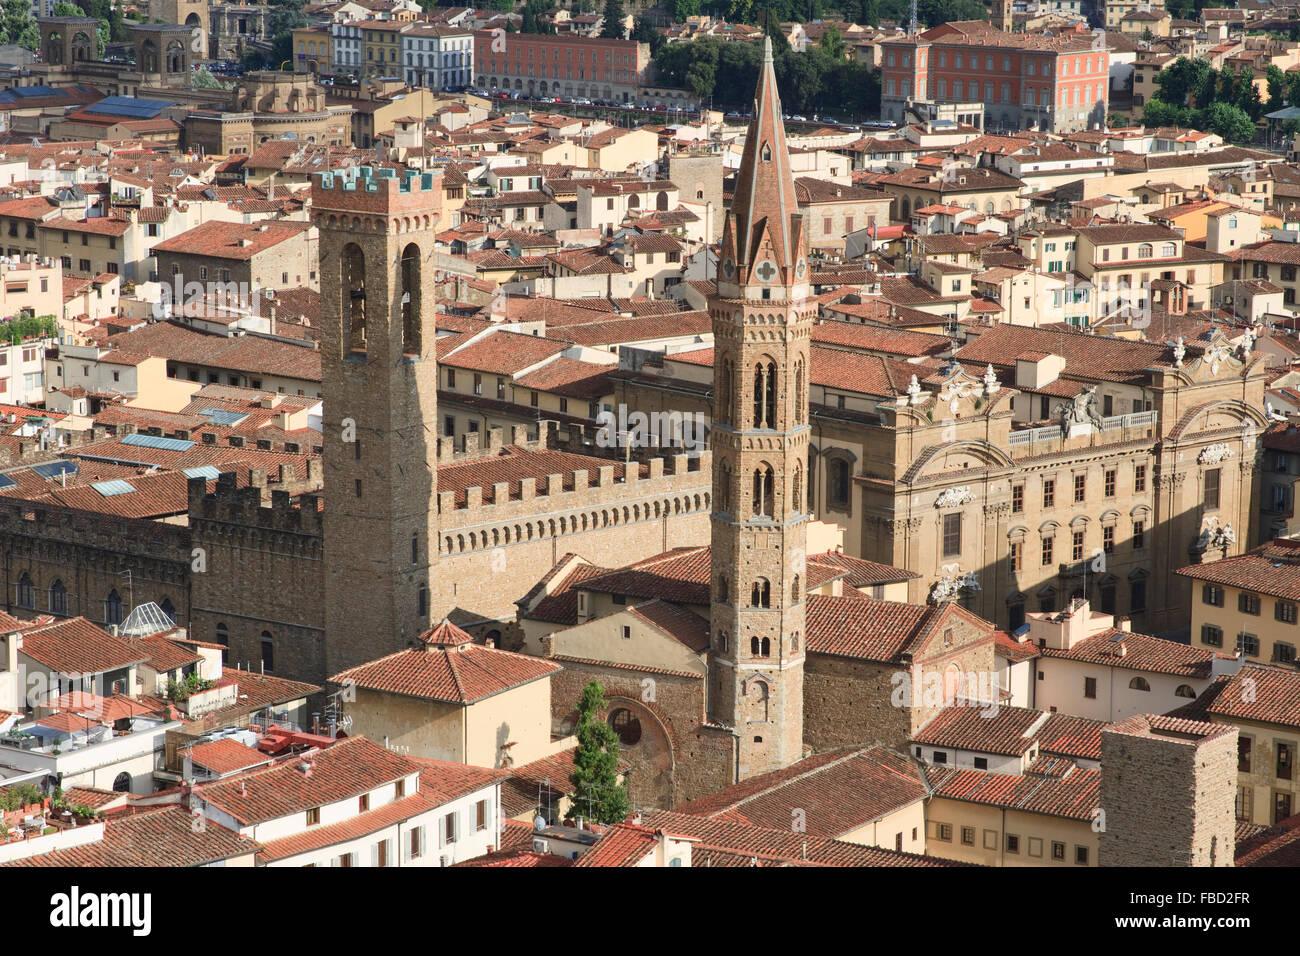 Badia Fiorentina and Museo Nazionale del Bargello in Florence, Italy, as seen from the Campanile di Giotto. Stock Photo